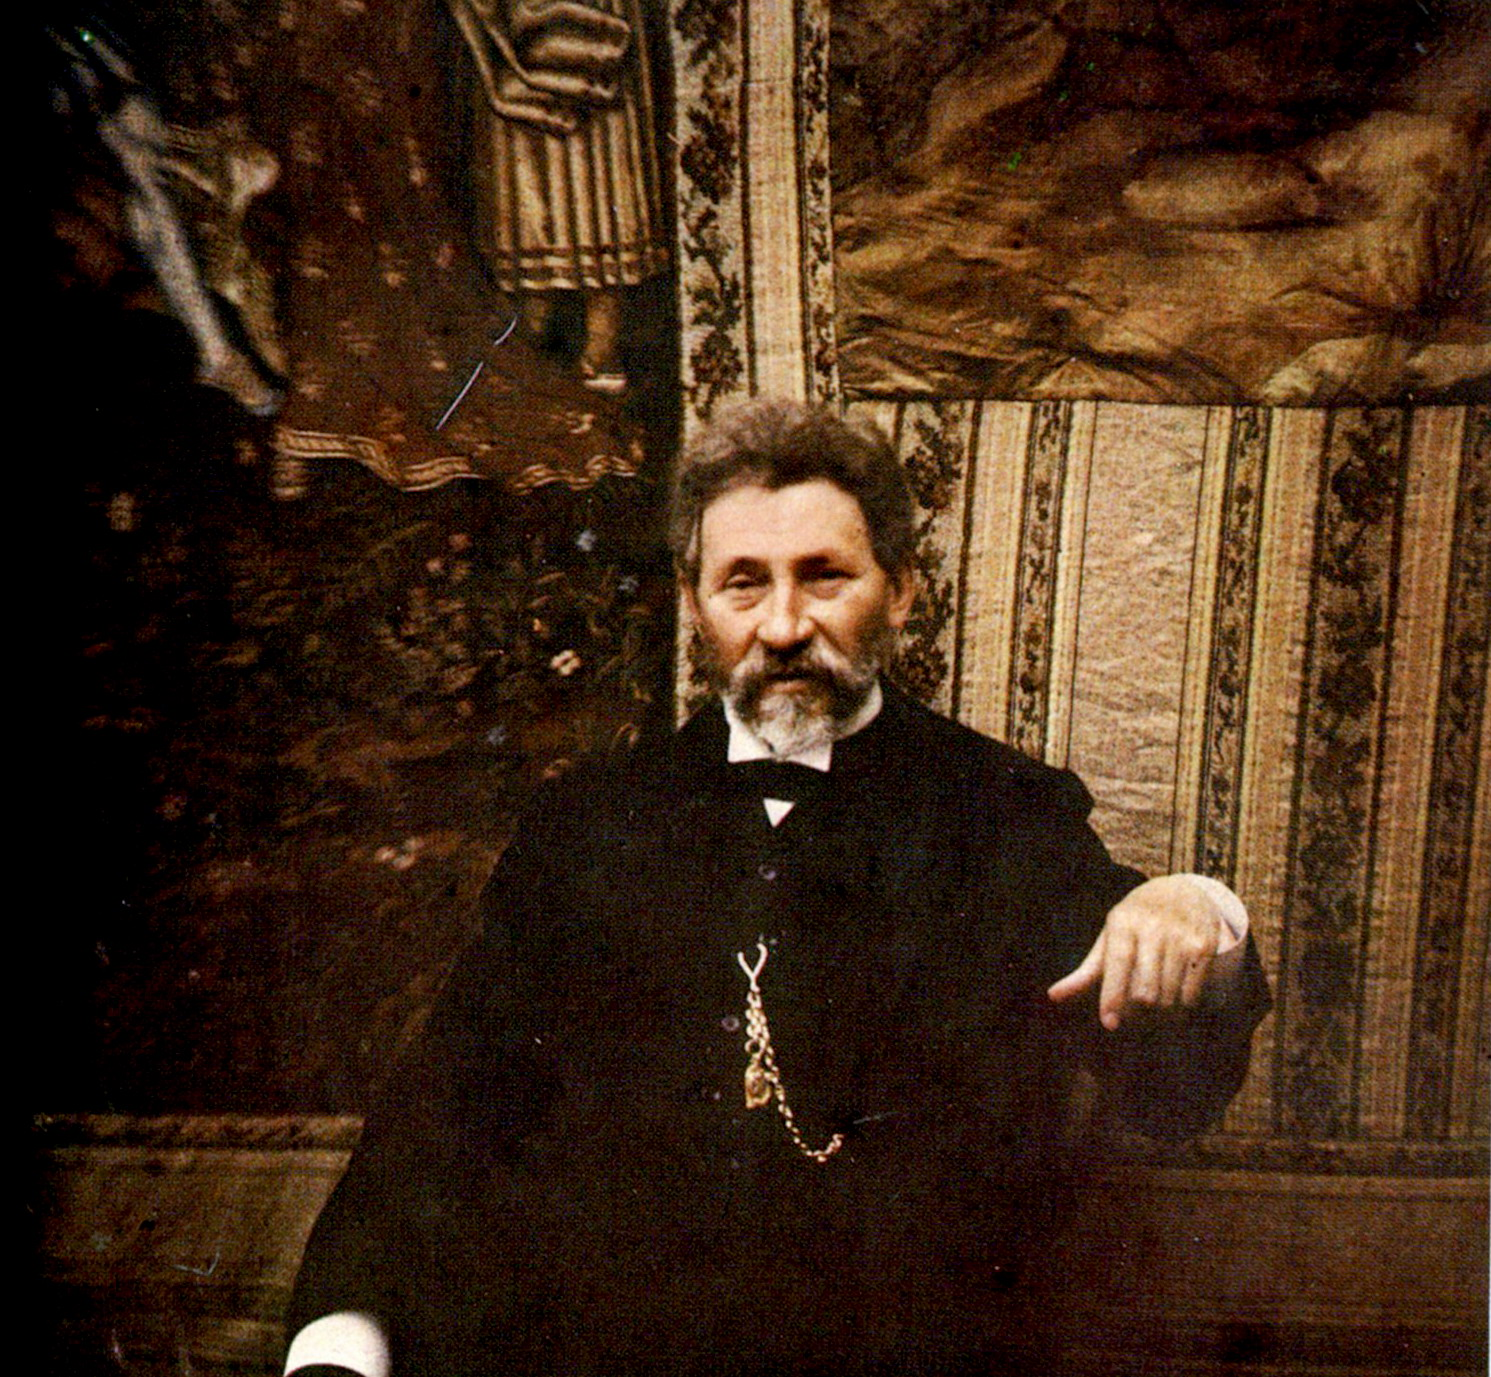 1910 Илья Репин на фото Леонида Андреева